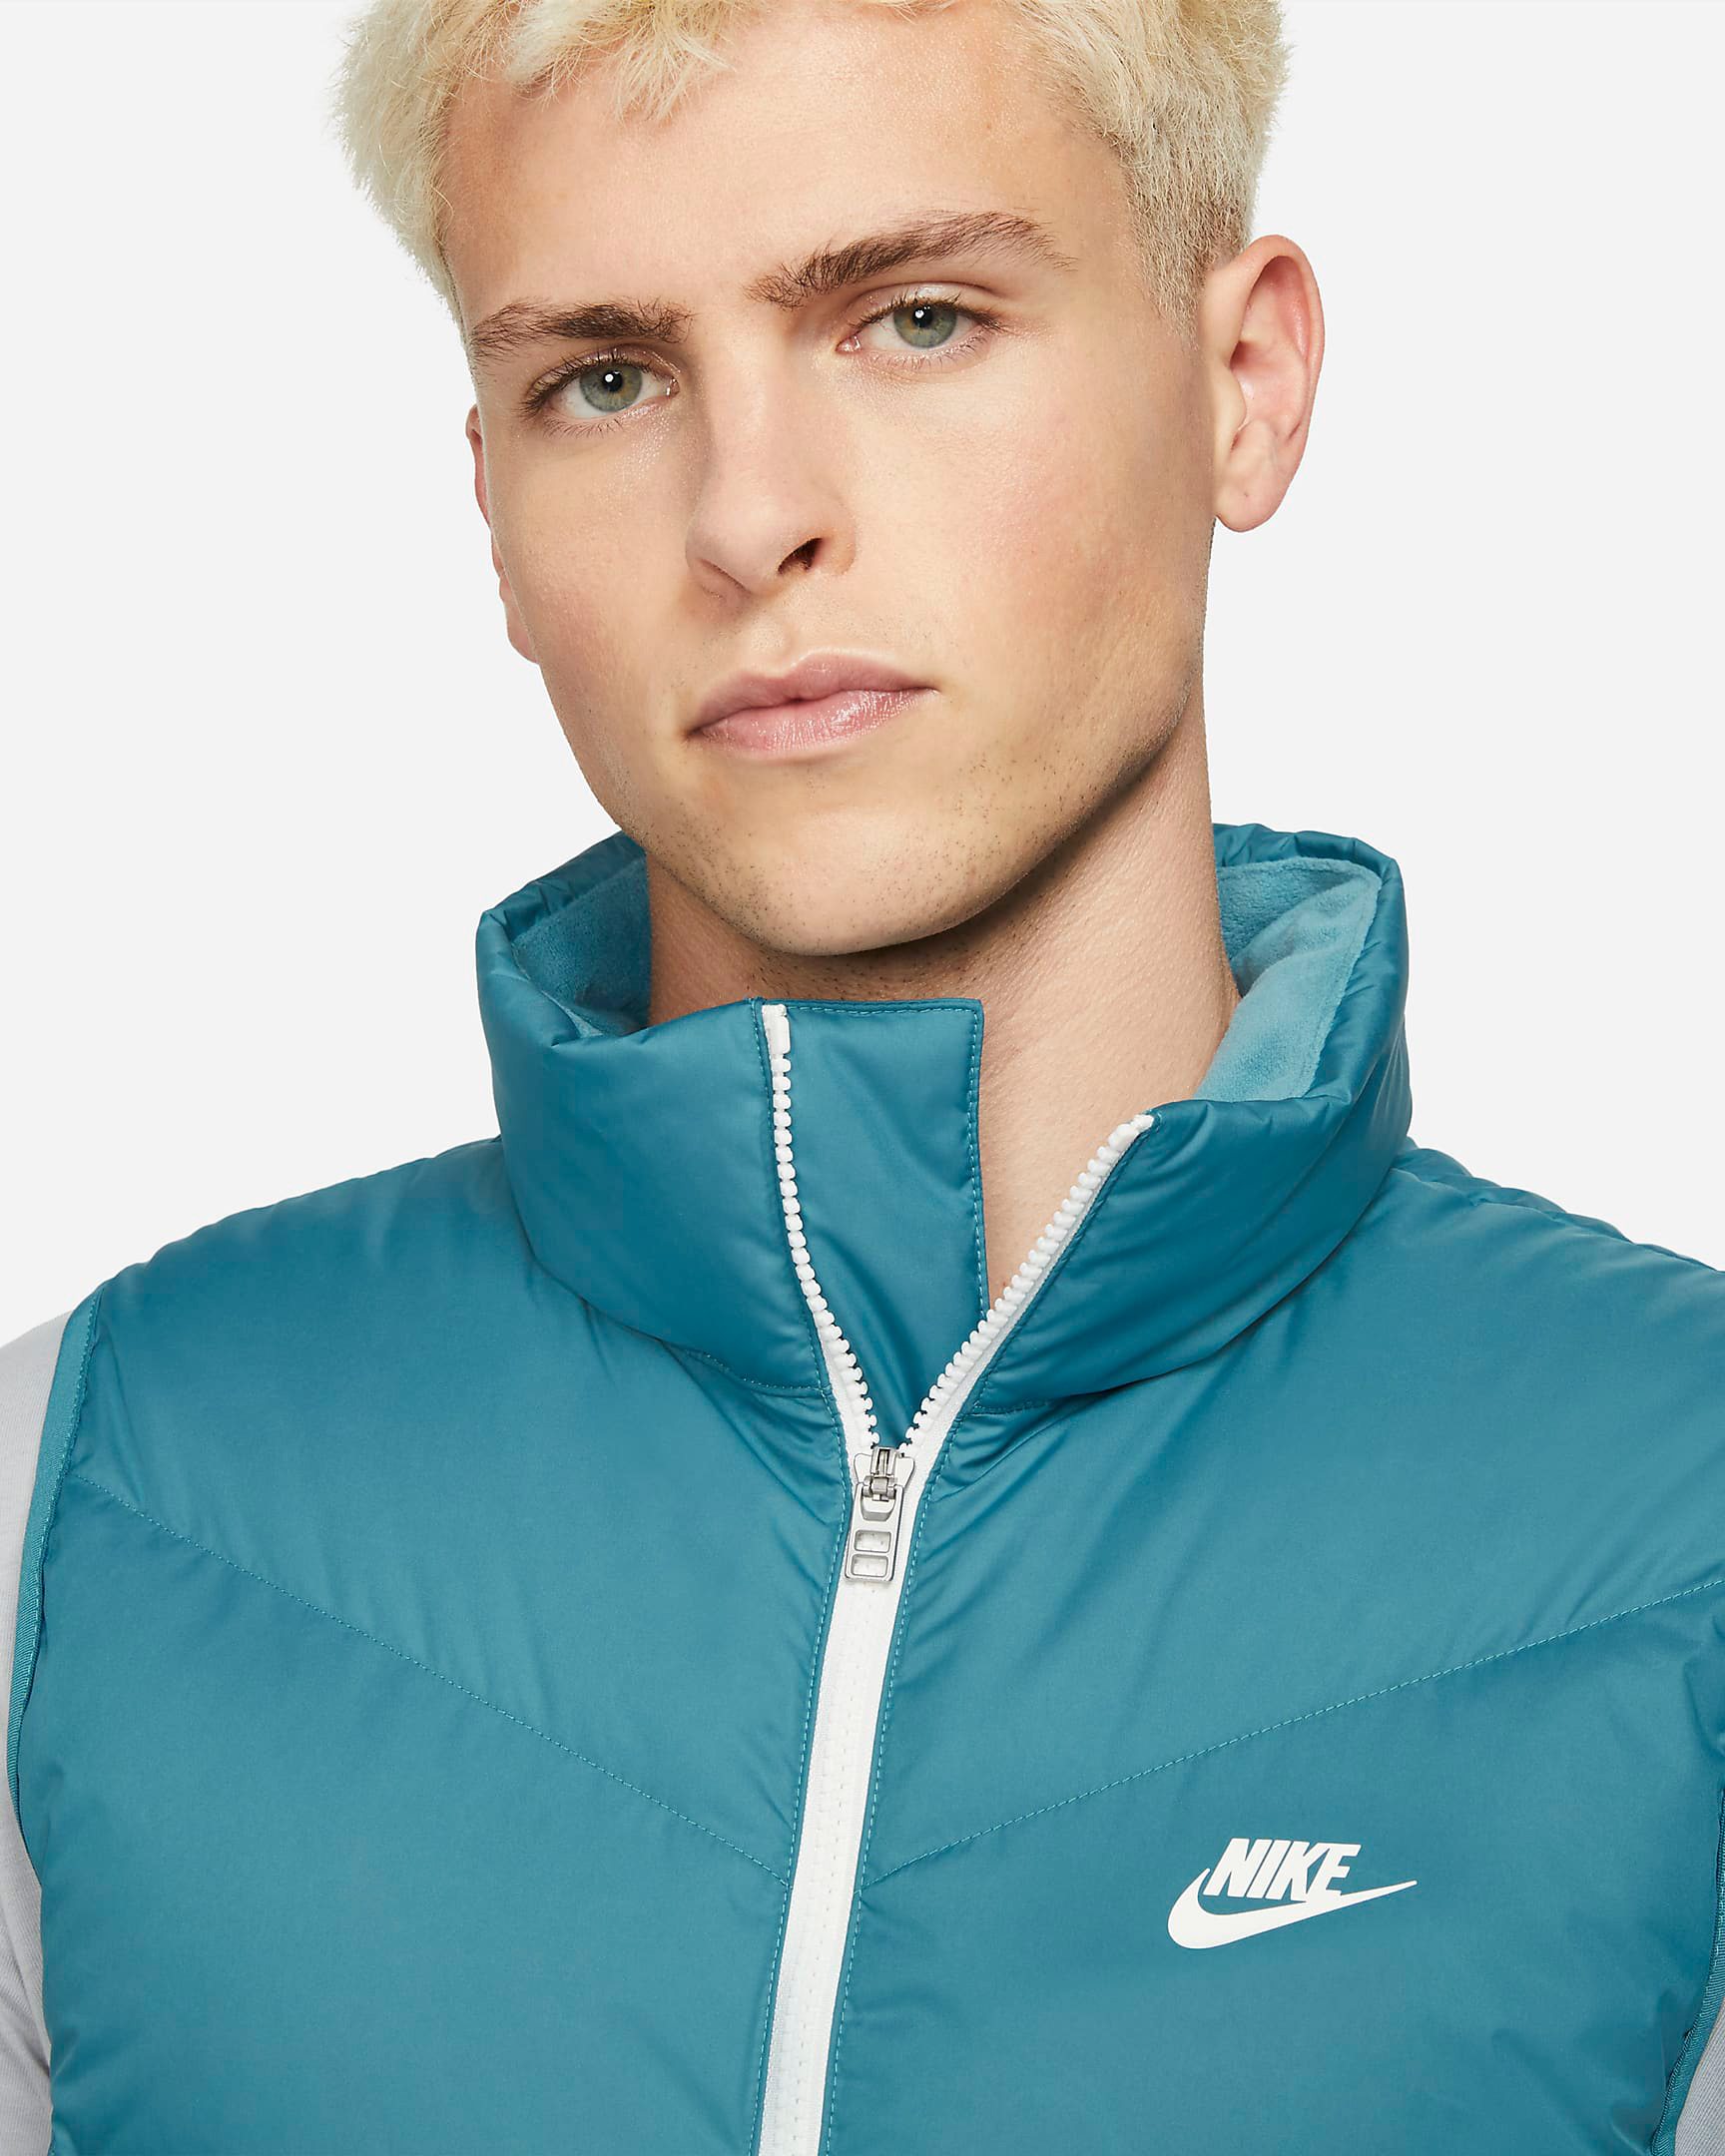 nike-sportswear-storm-fit-windrunner-vest-jacket-rift-blue-court-blue-sail-3